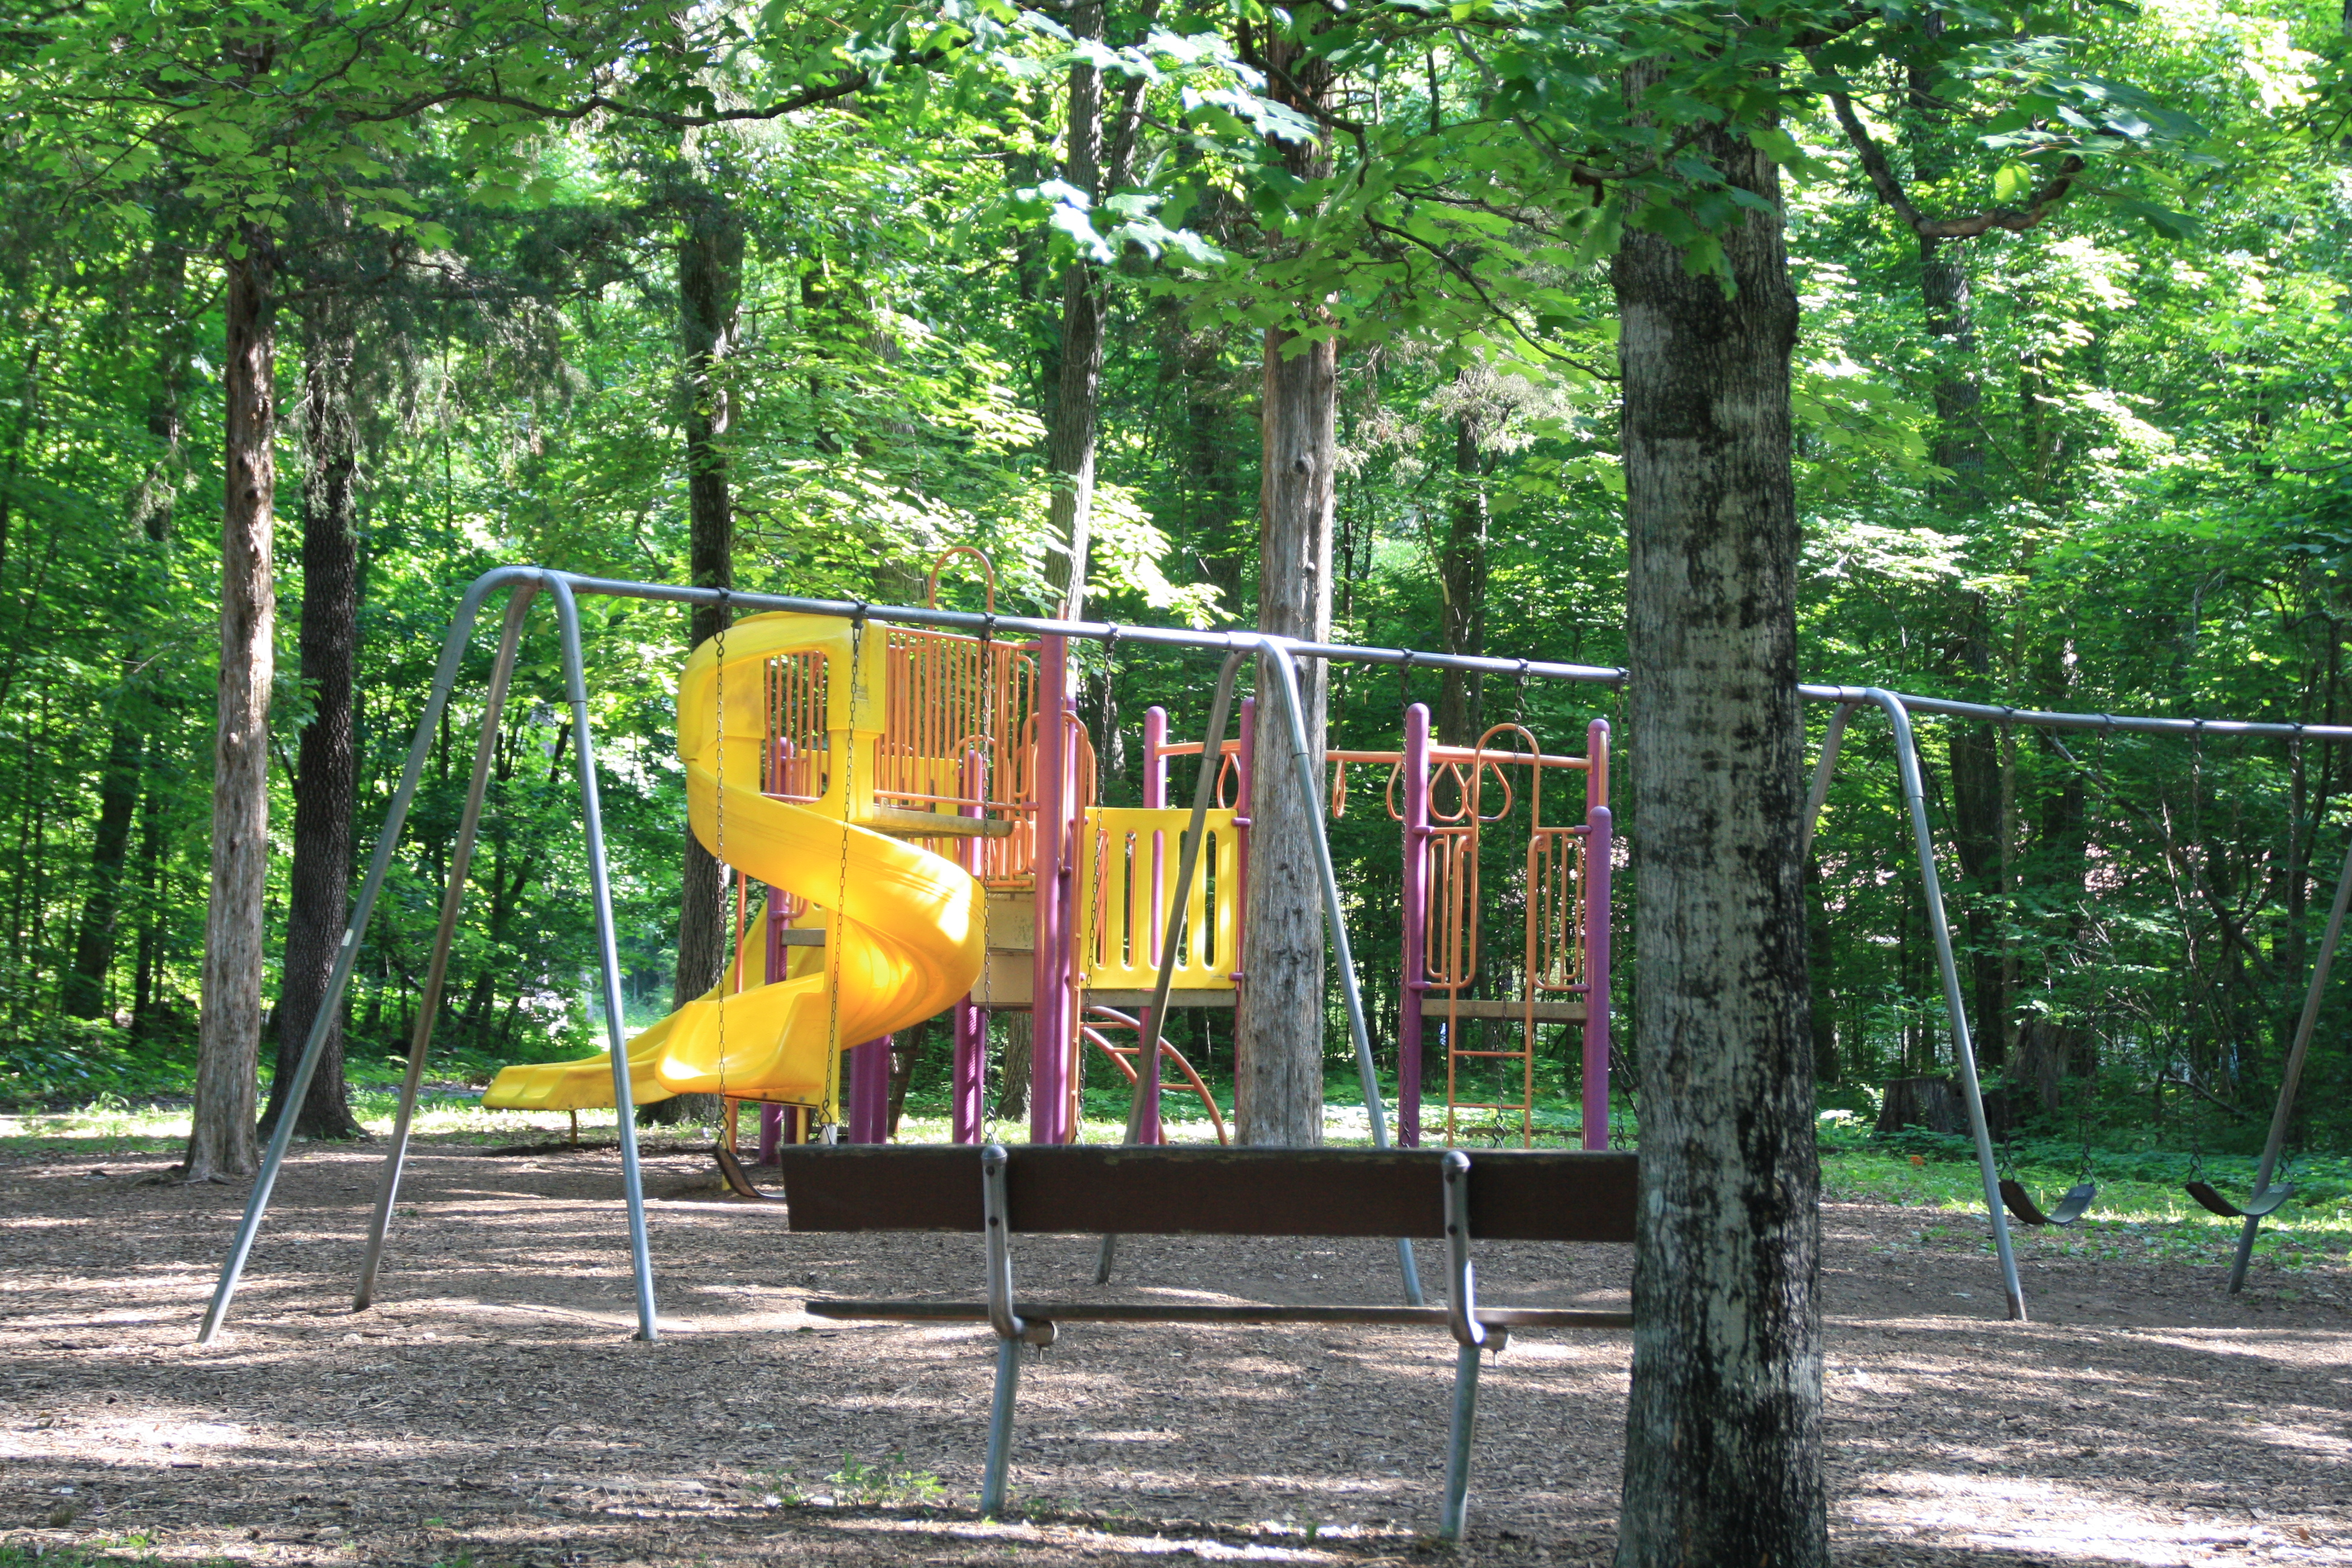 Cedars of lebanon state park lebanon tn crazy4camping for Marshalls cedar park